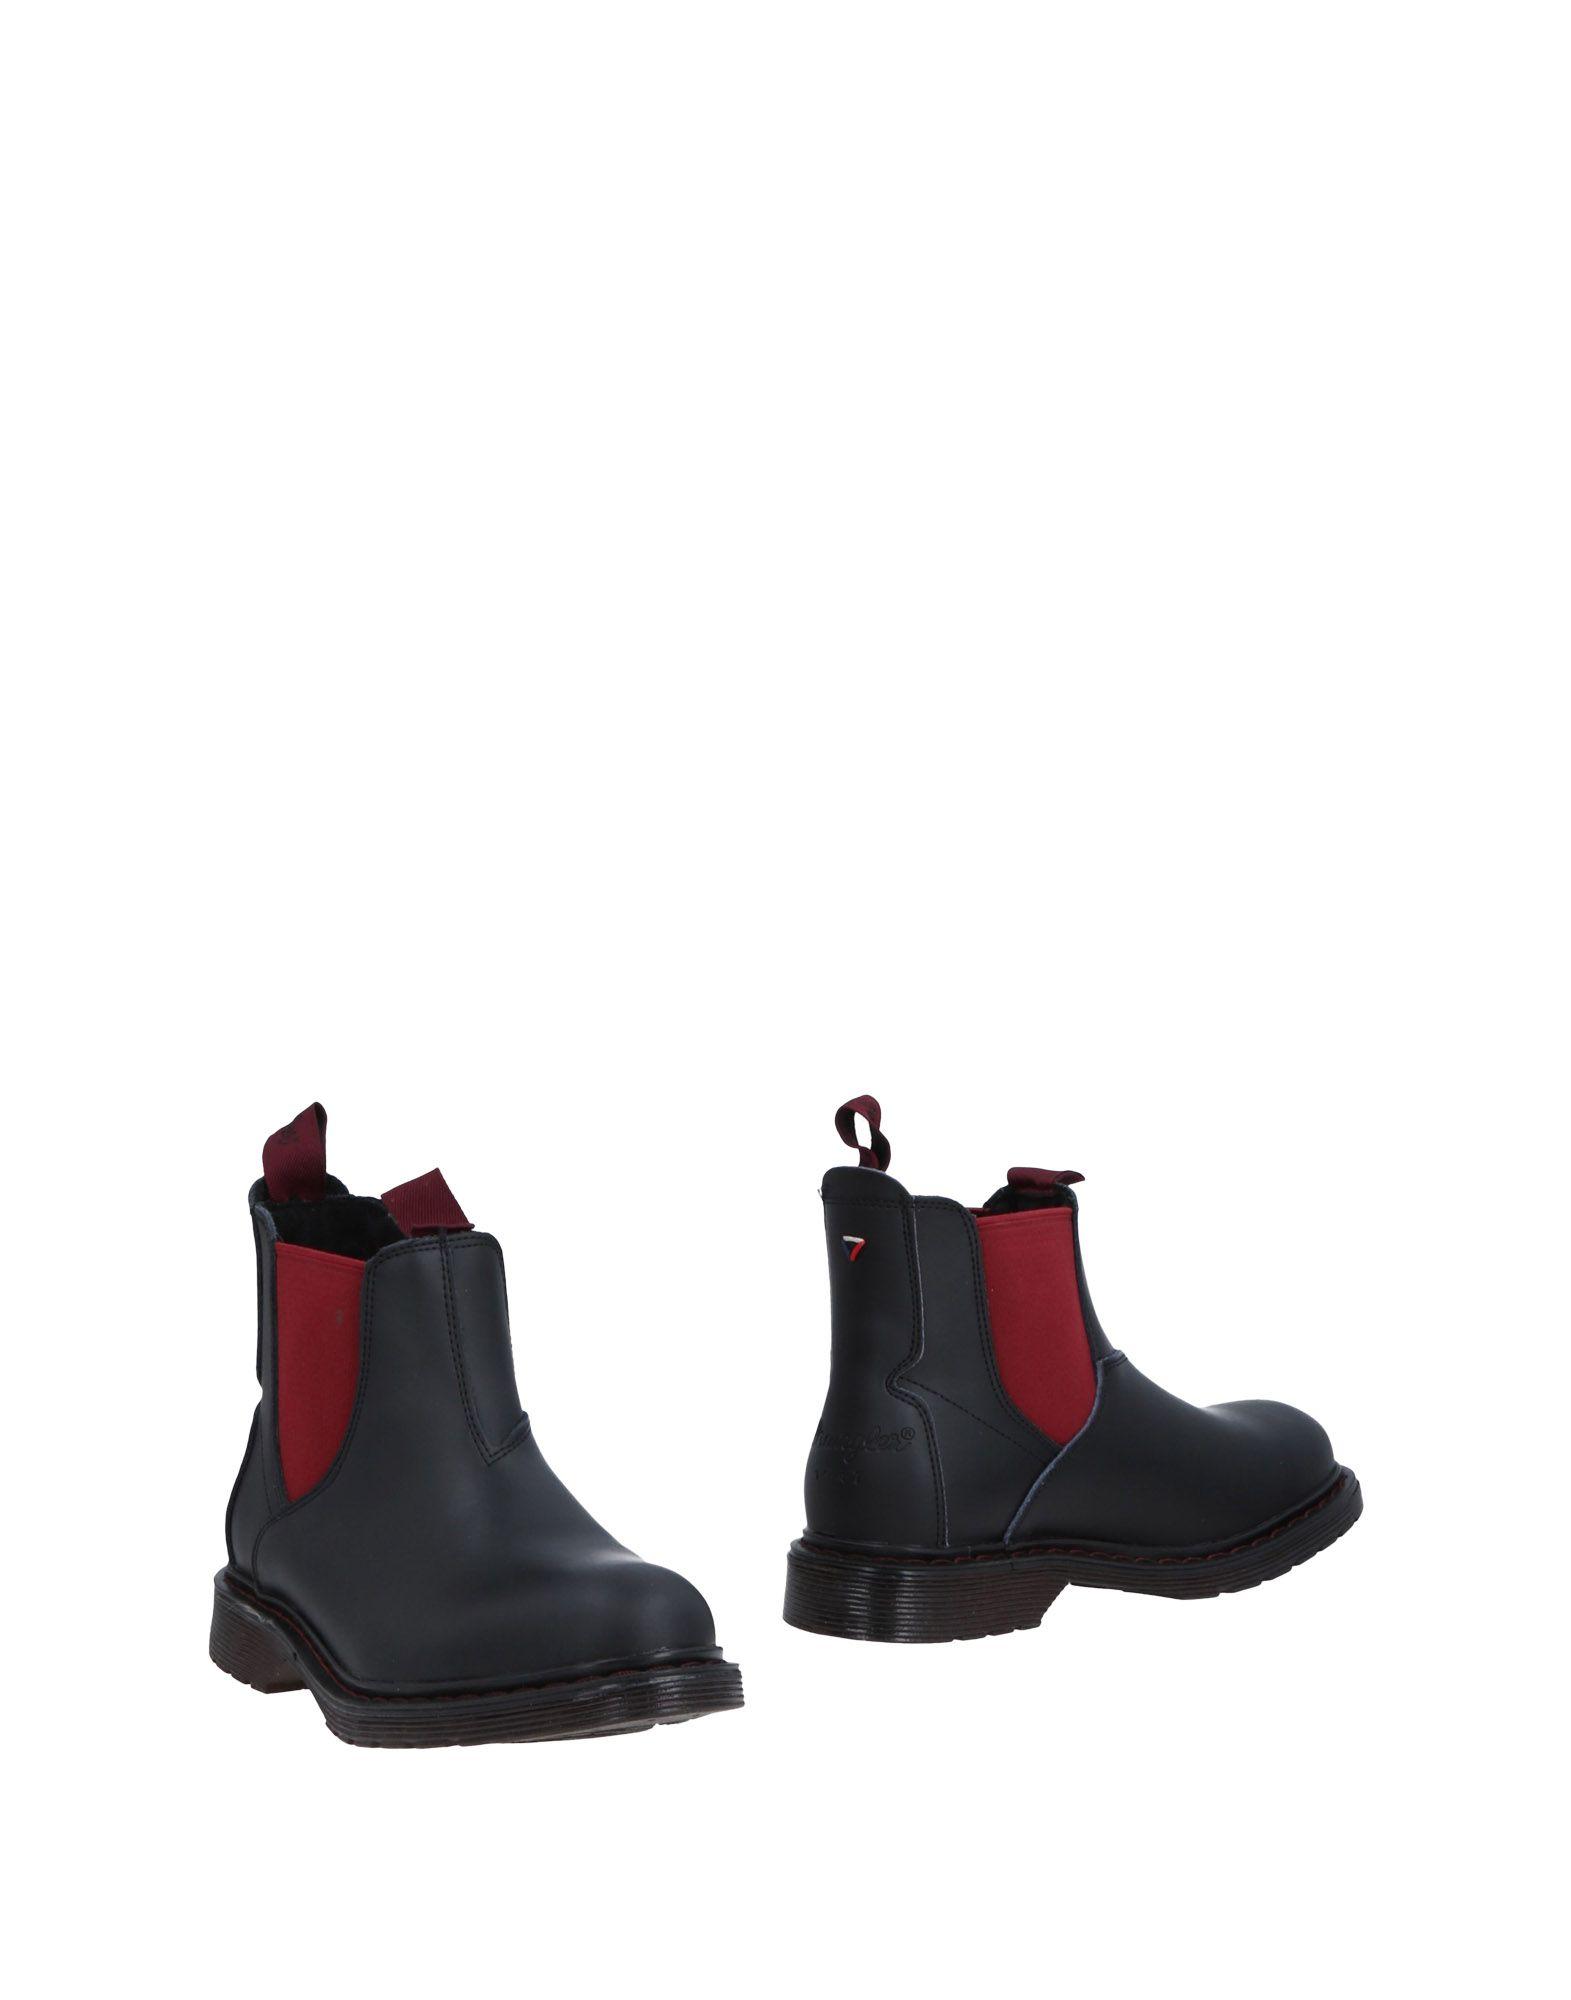 Wrangler Stiefelette Damen  11467291NR 11467291NR 11467291NR Gute Qualität beliebte Schuhe b5f750